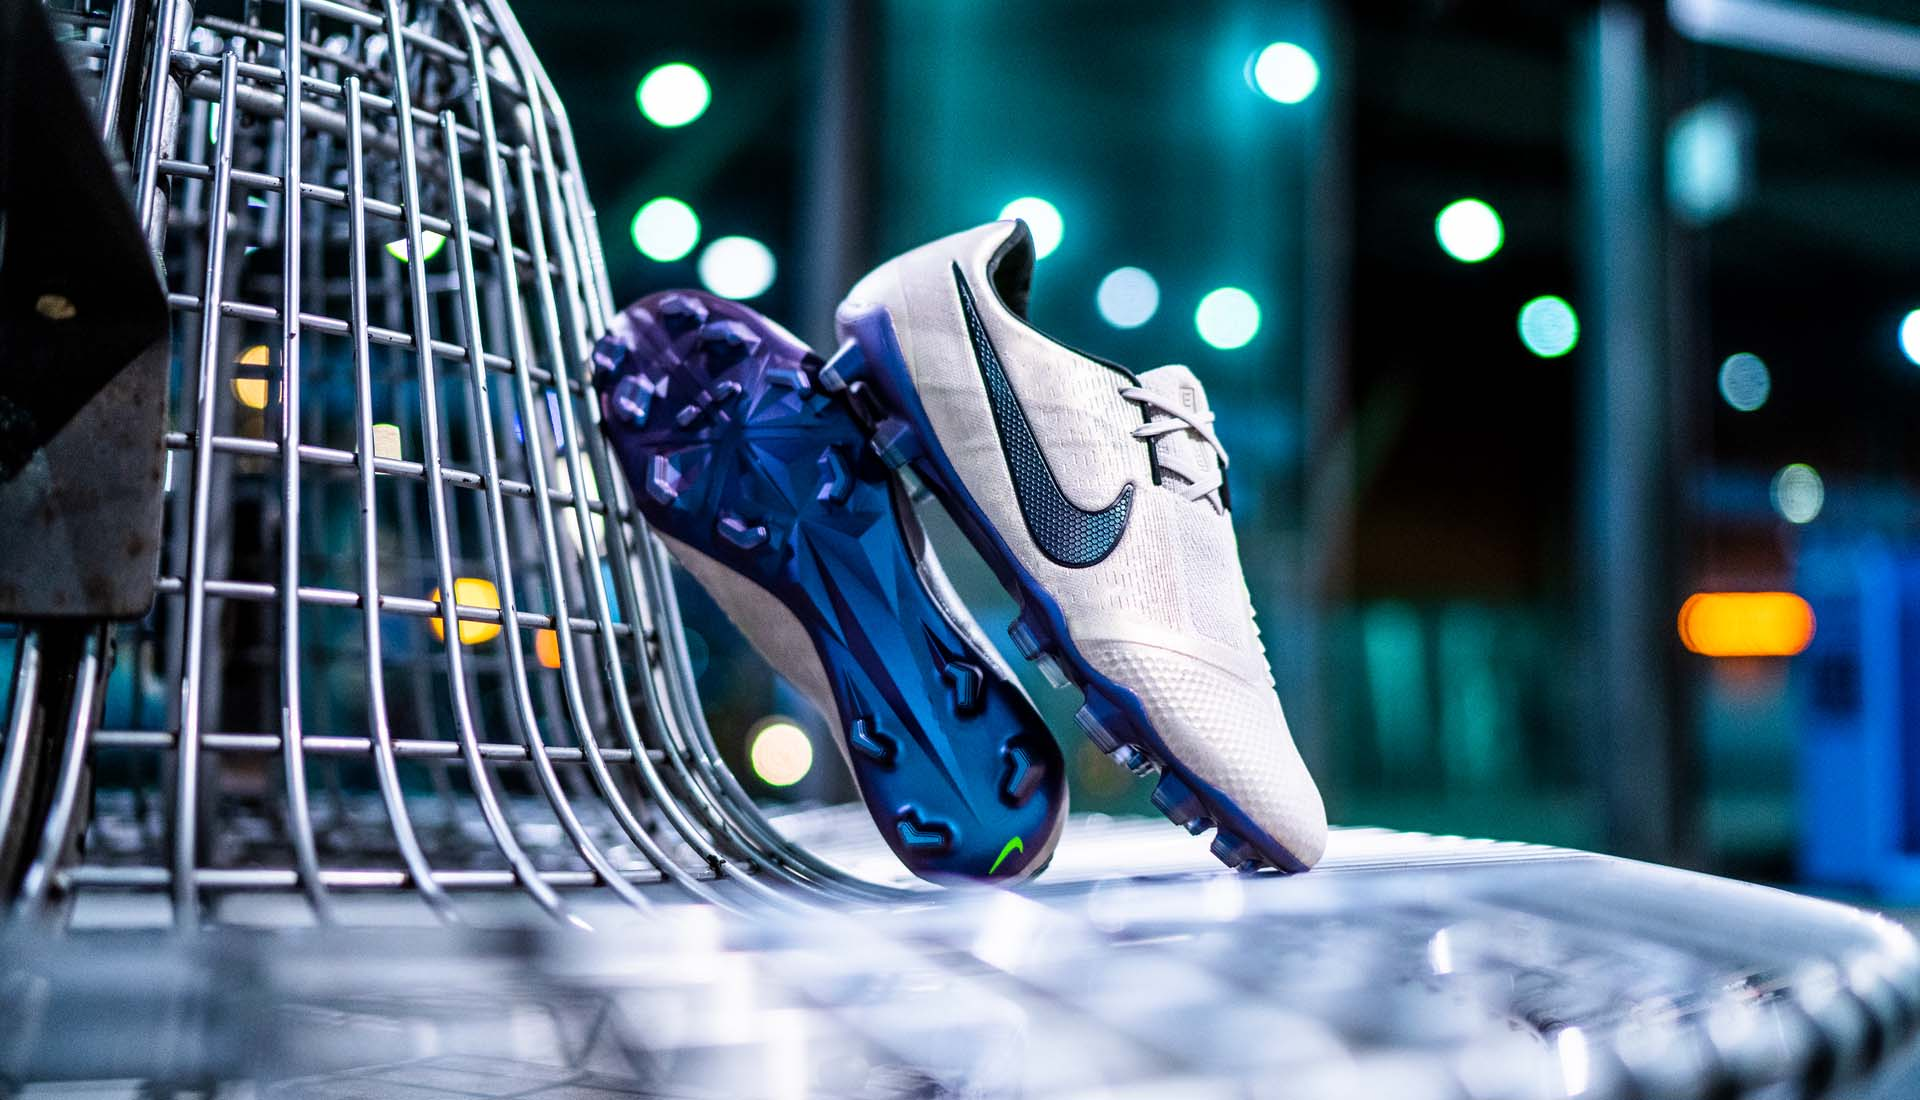 Giày đá bóng Nike Phantom Venom Terra pack